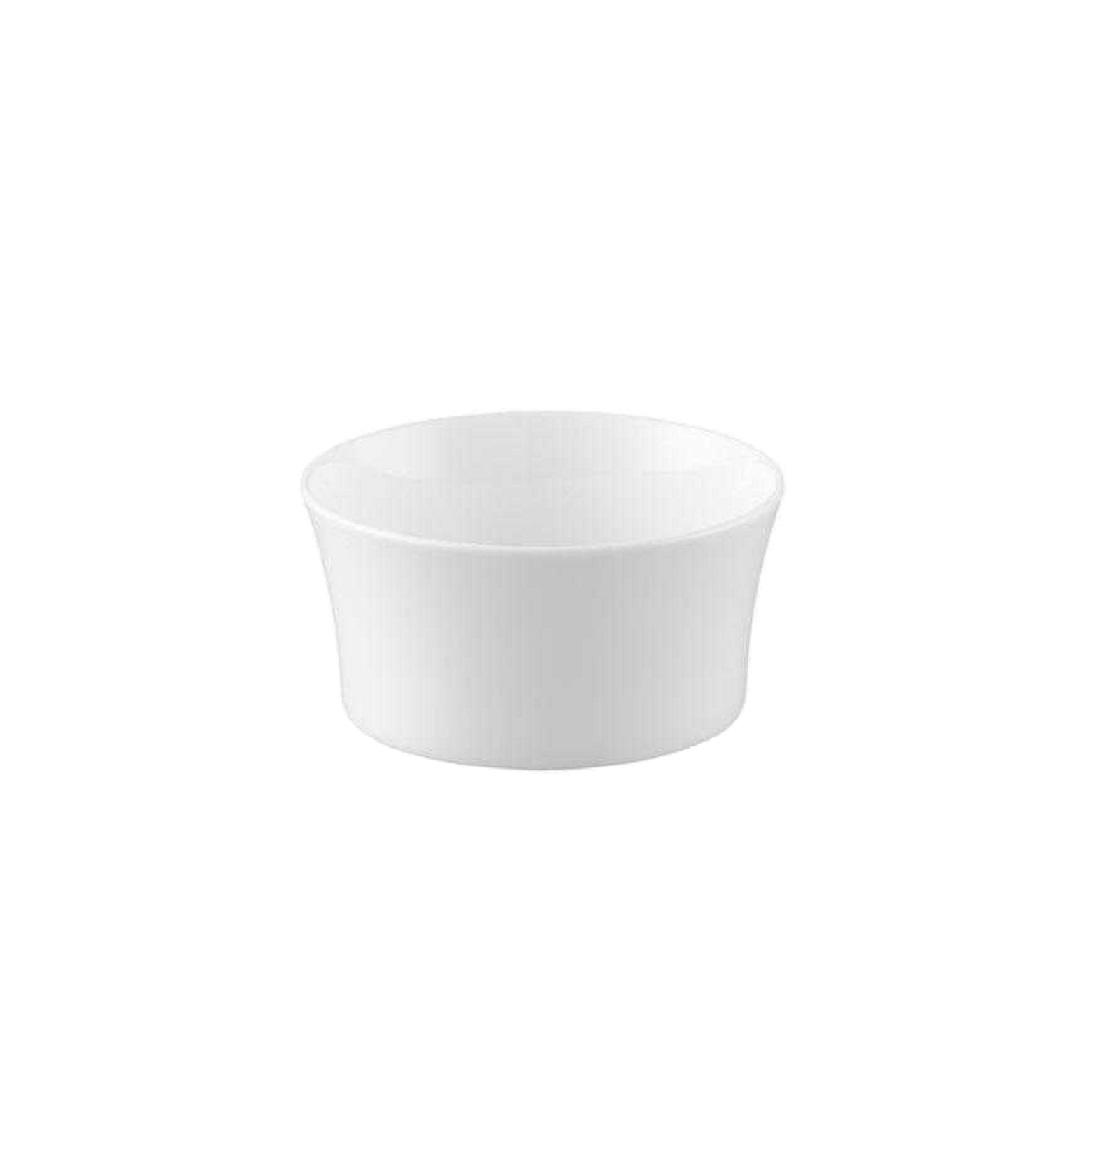 Пиала фарфоровая Rosenthal JADE, объем 0,35 л, белый Rosenthal 61040-800001-10430 фото 1